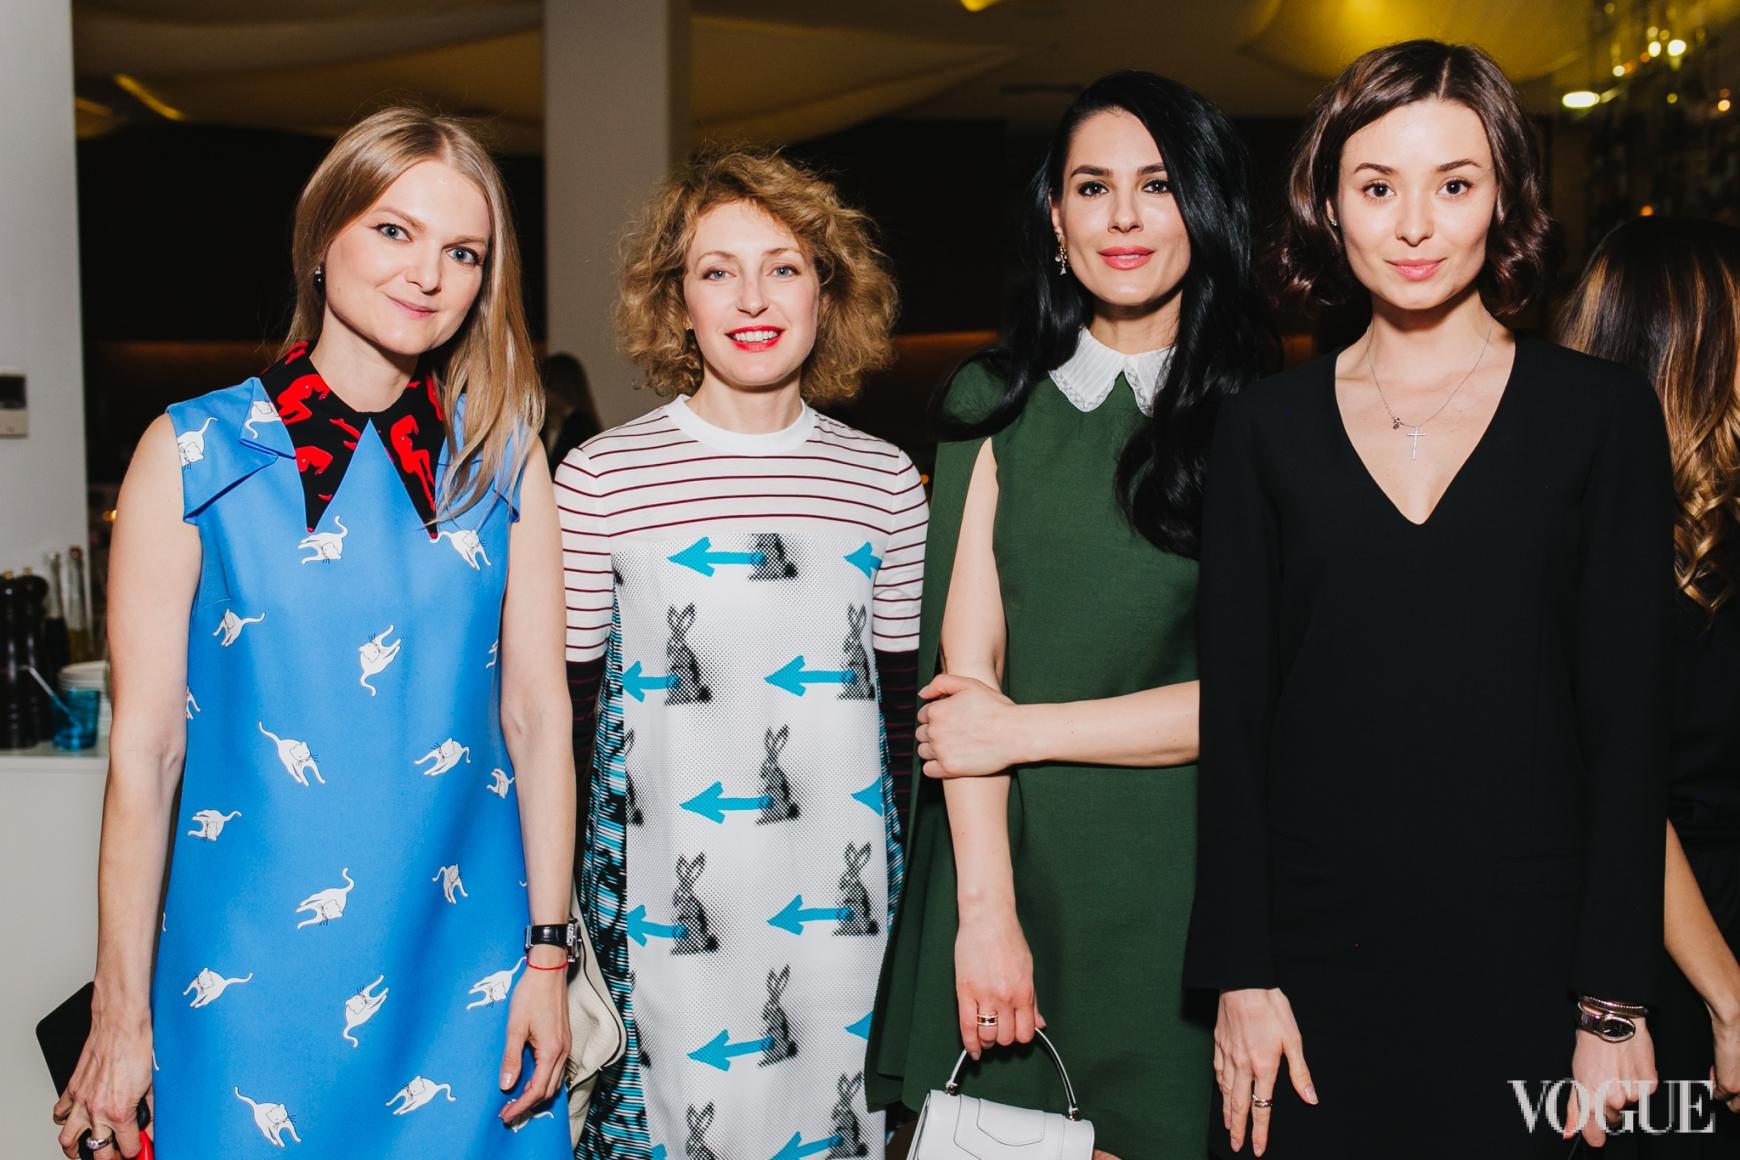 Вера Титова, Светлана ТАккори, Маша Ефросинина  Зоя Литвин